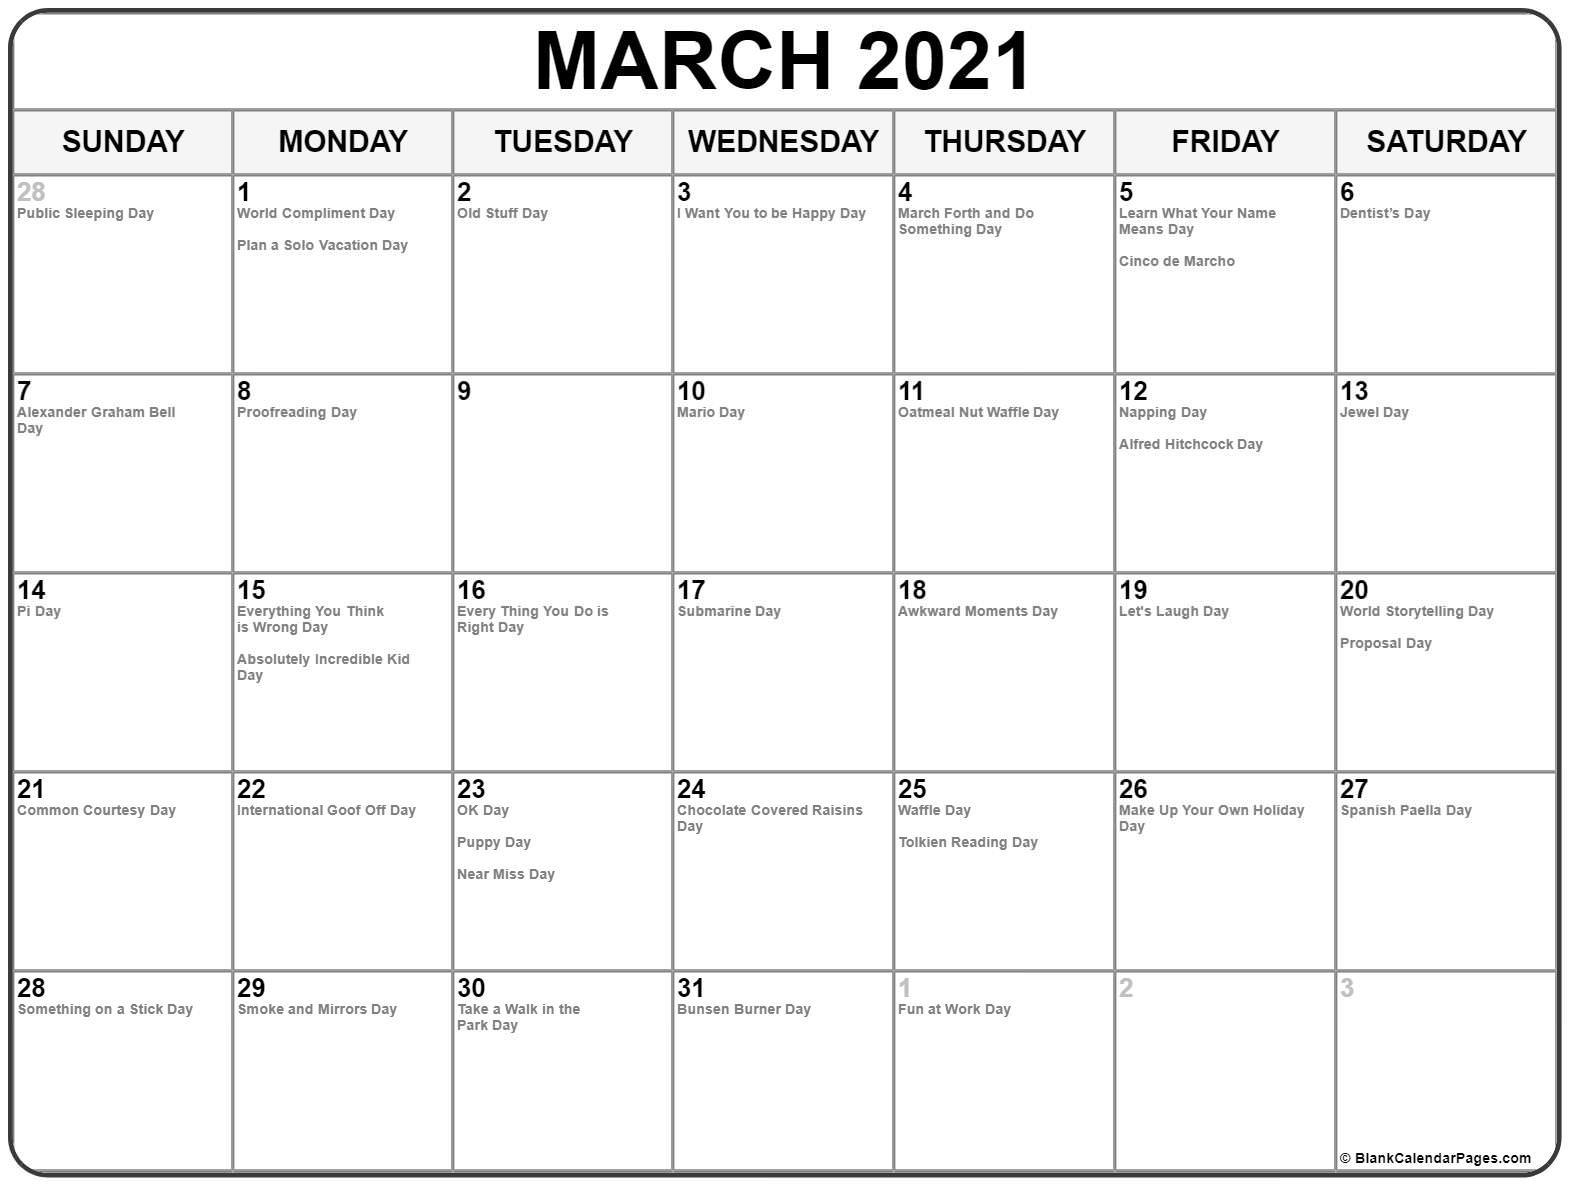 March 2021 Calendar With Holidays-National Wellness Calendar 2021